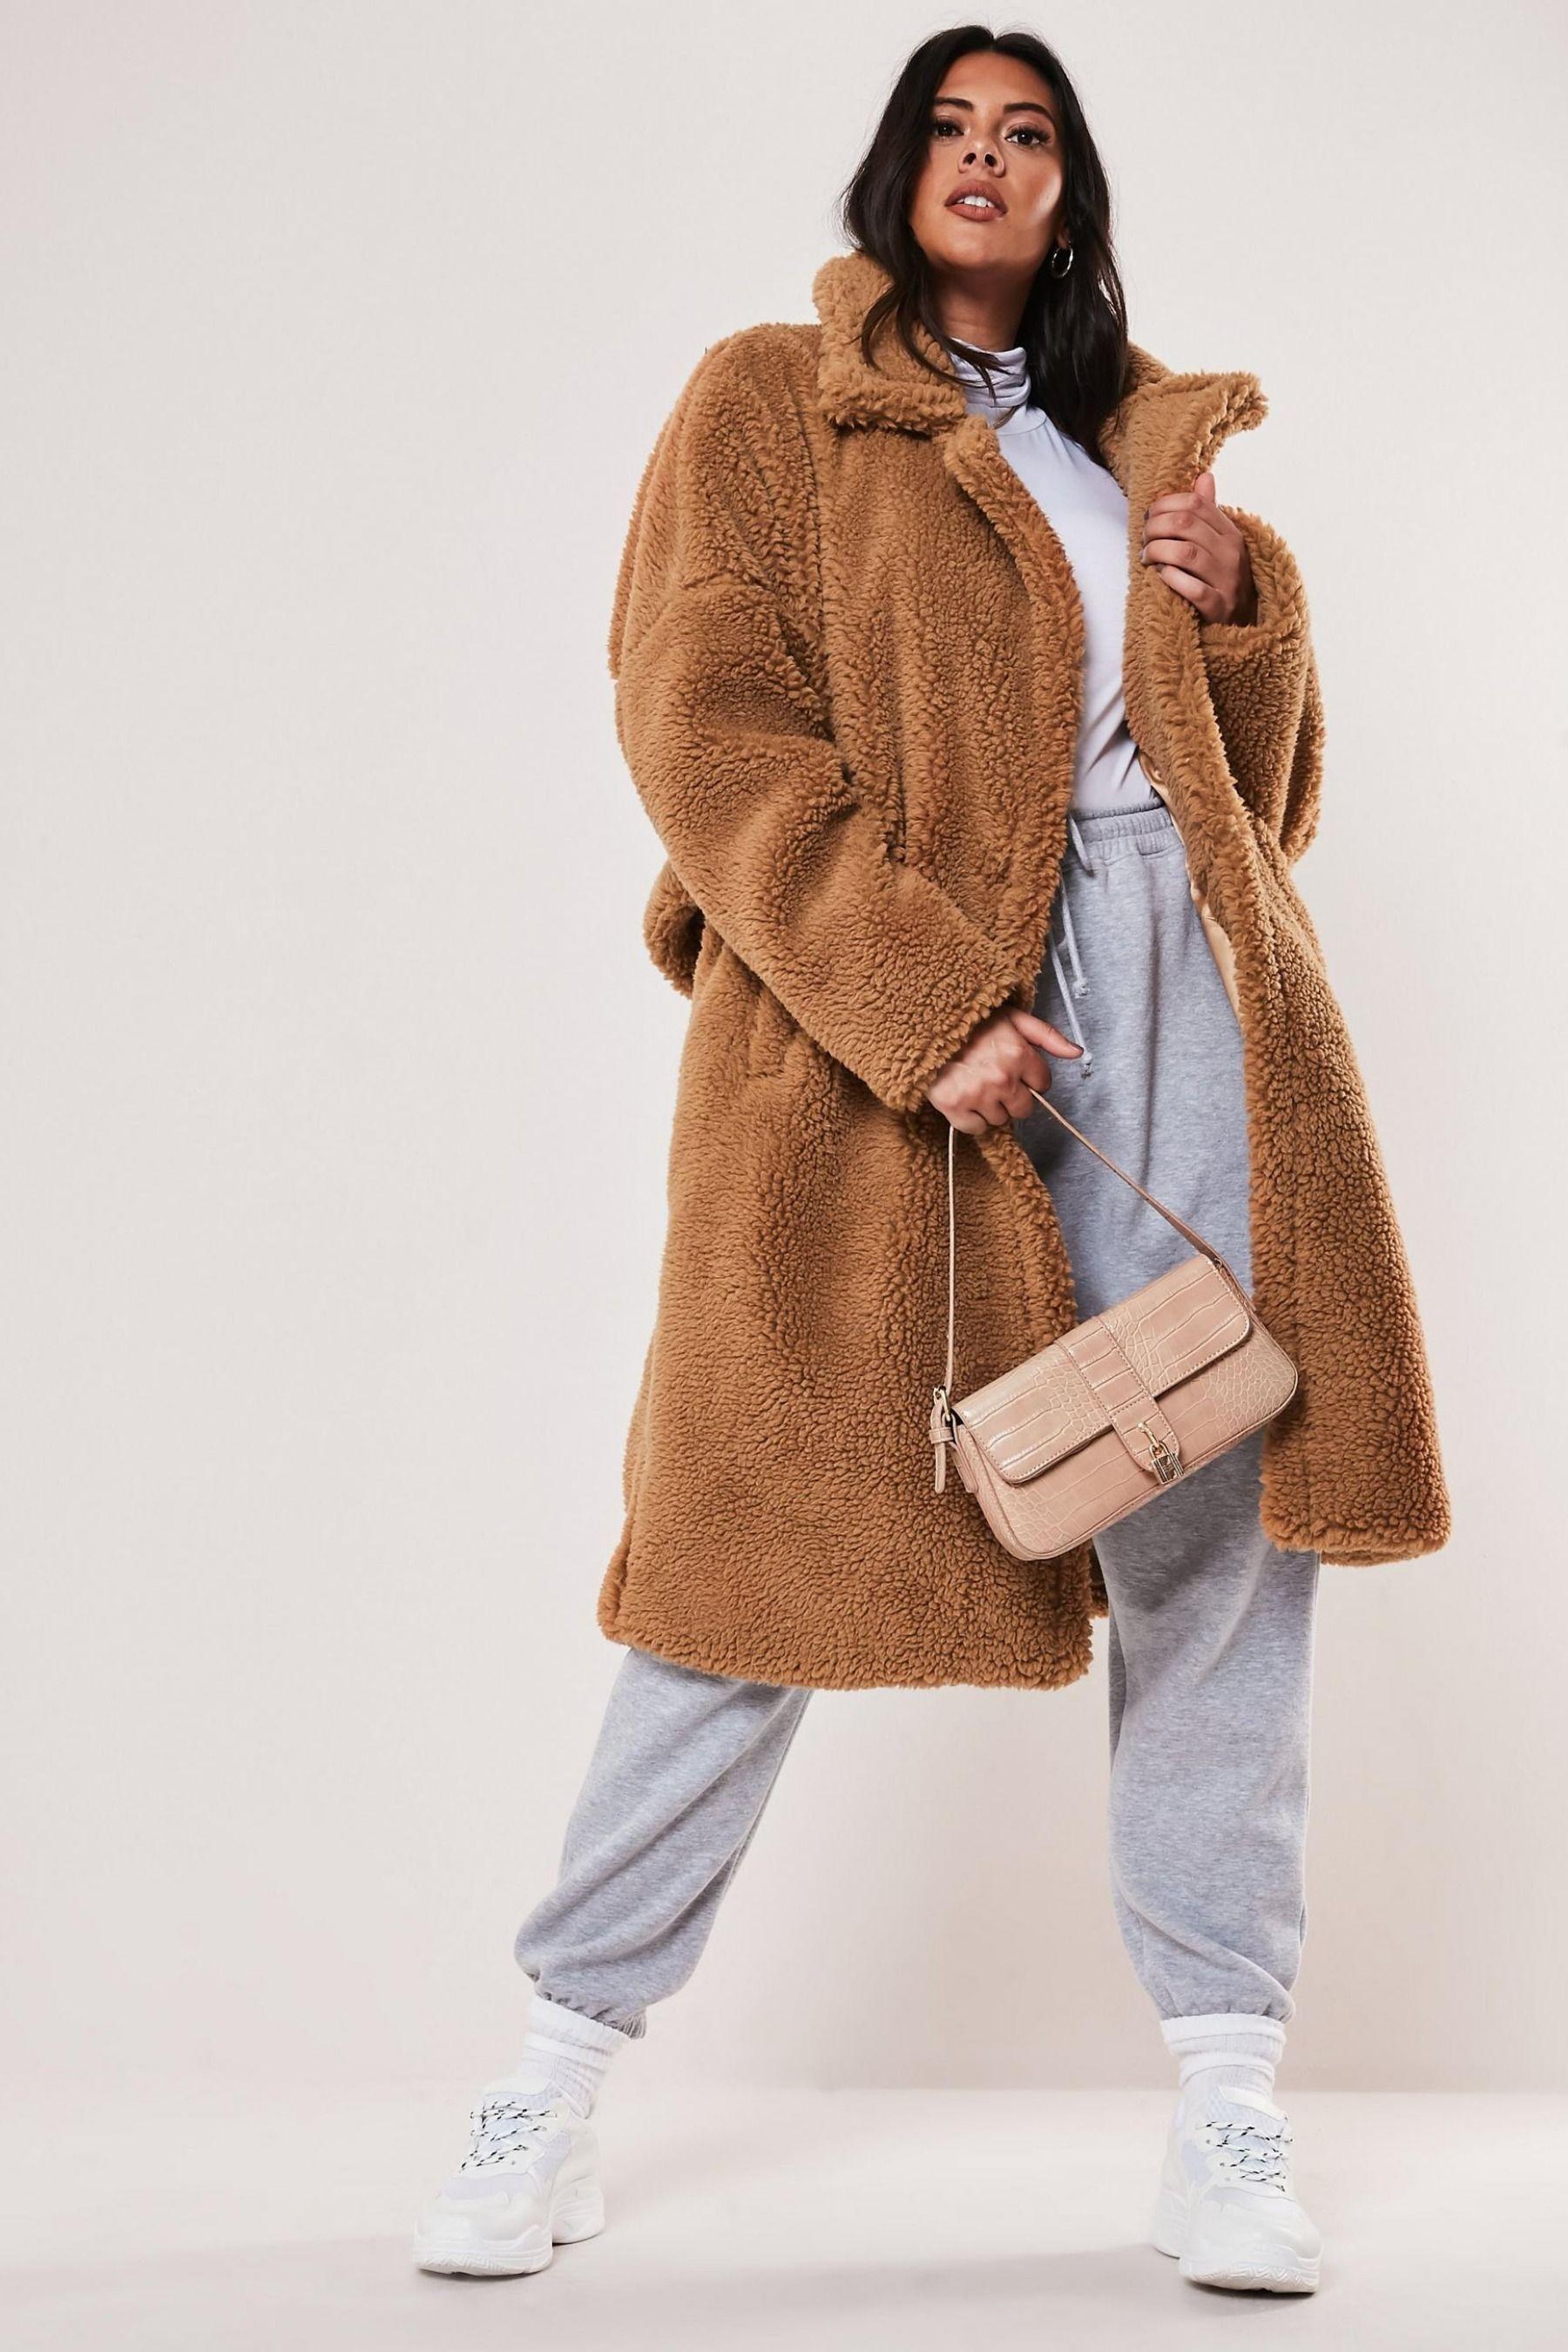 Plus Size Tan Oversized Long Teddy Coat Plus Size Outfits Plus Size Fashion Fashion [ 2700 x 1800 Pixel ]